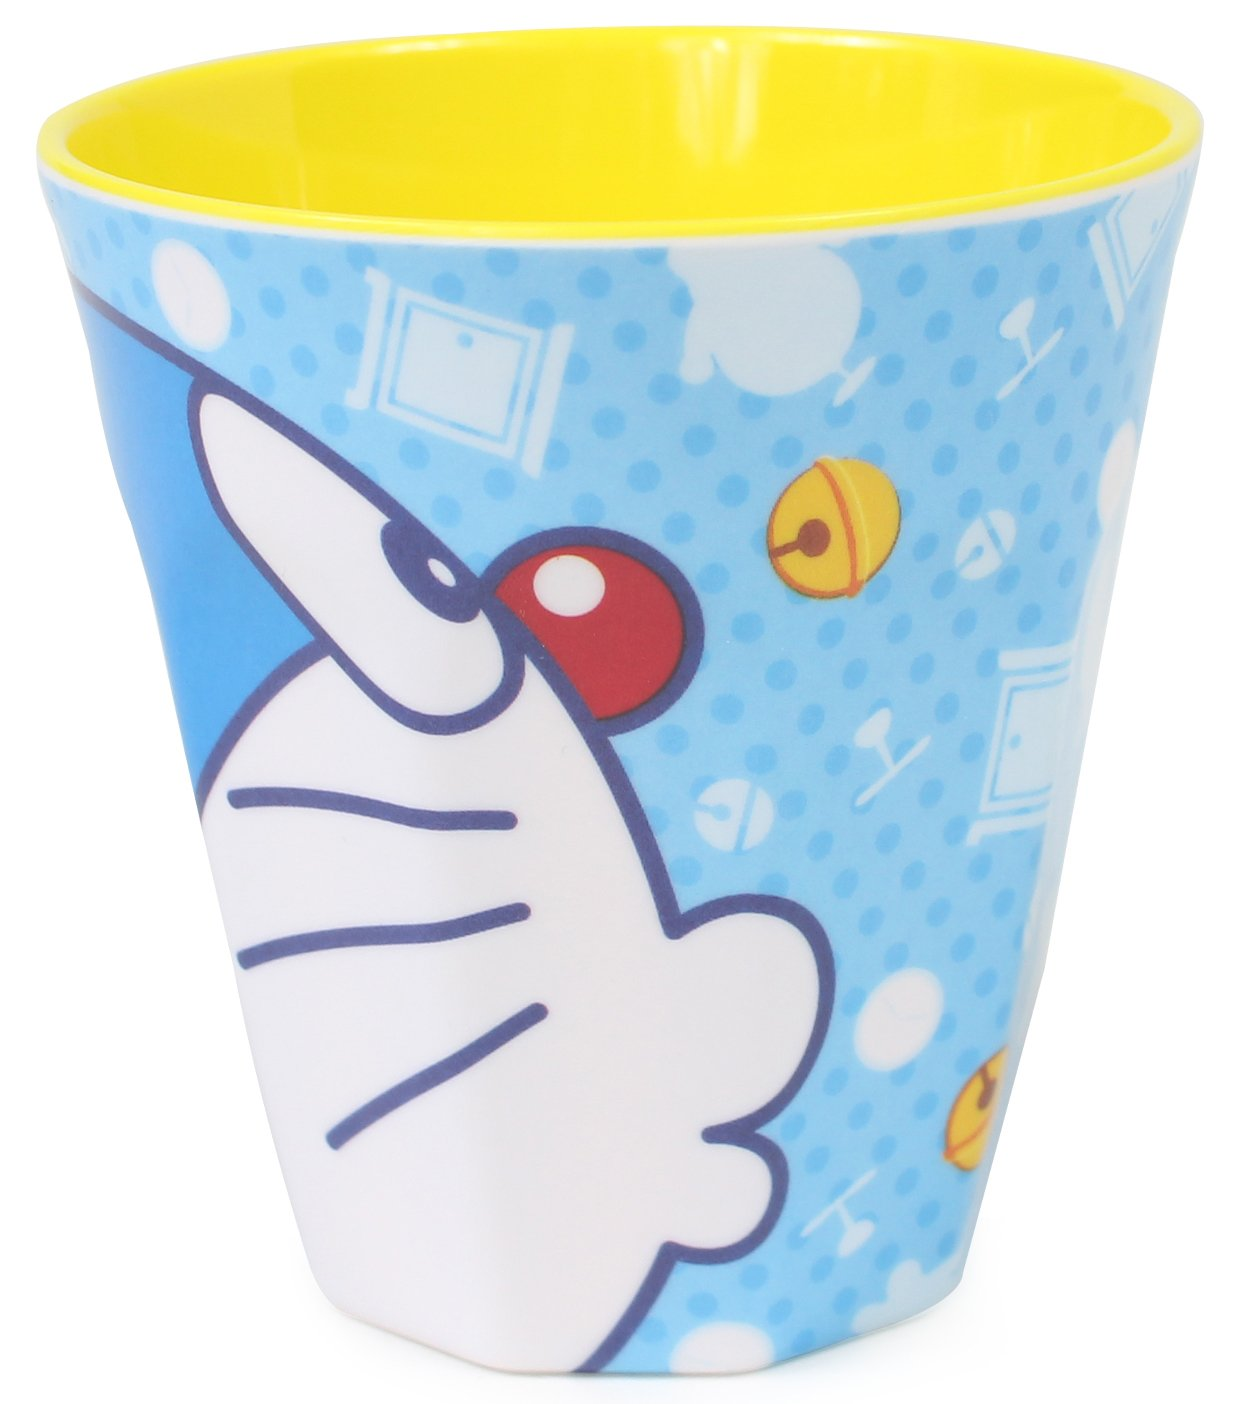 Doraemon Melaminbecher 041070 Ver.3 // Blau